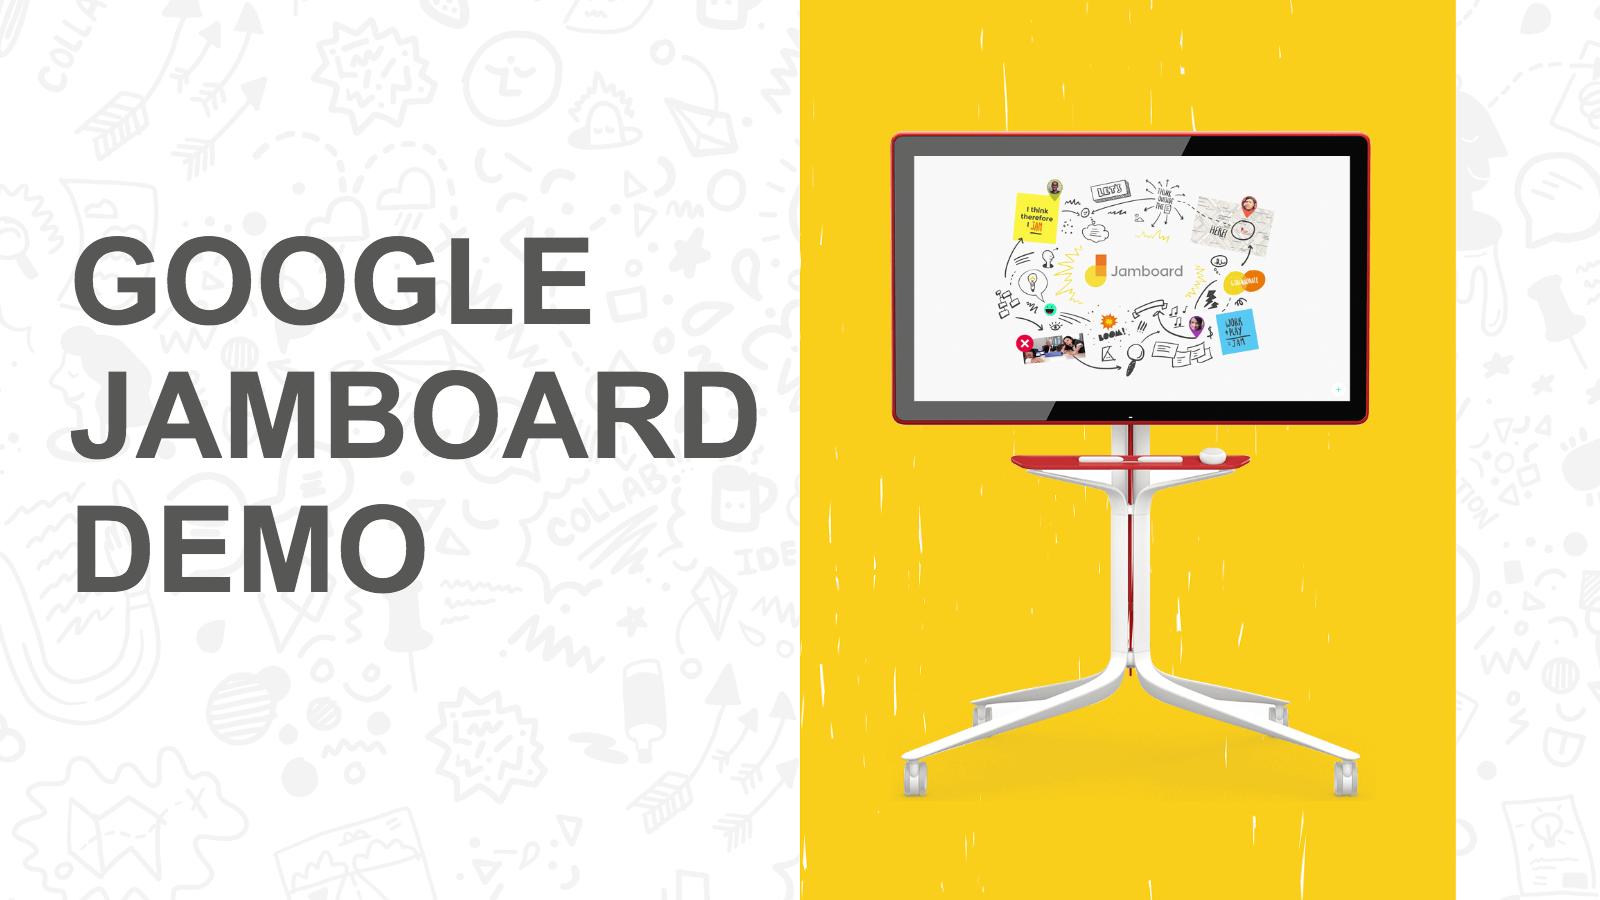 Google Jamboard Demo